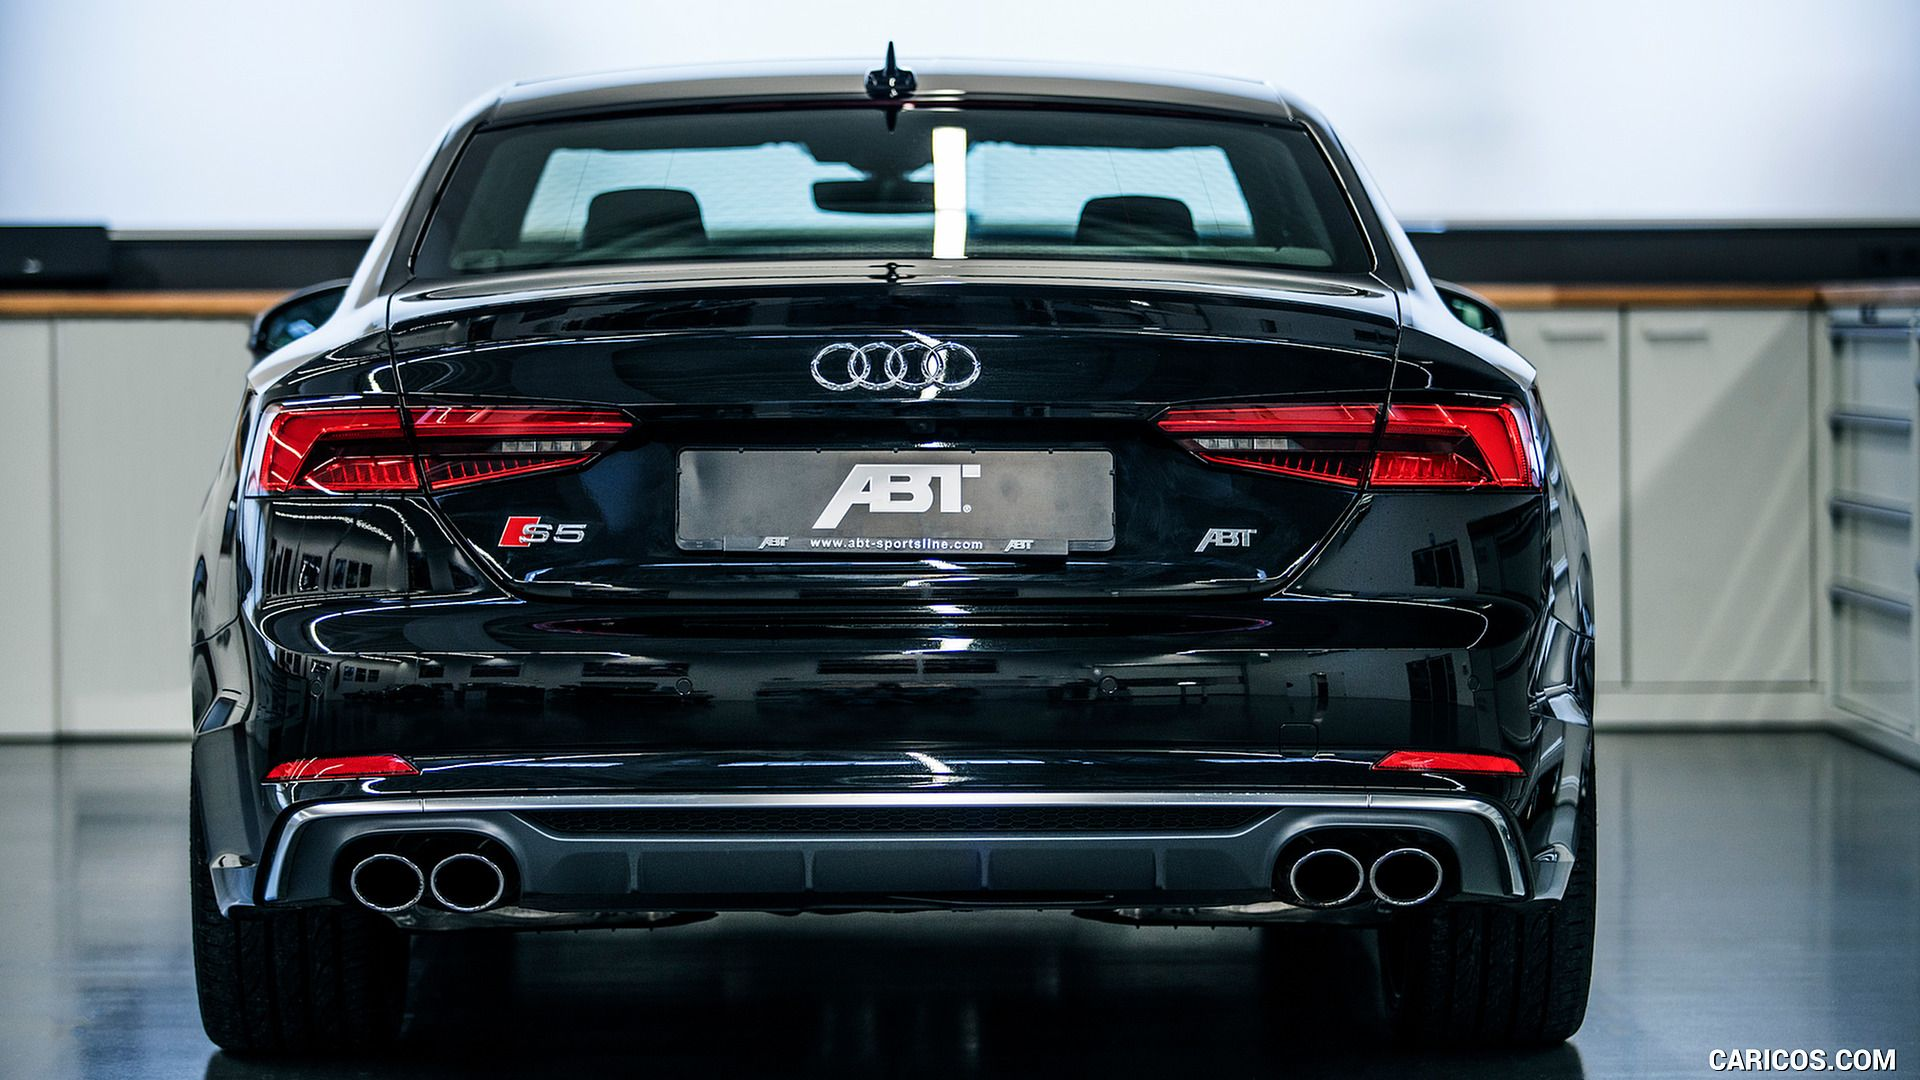 The abt audi middle class car top class performance